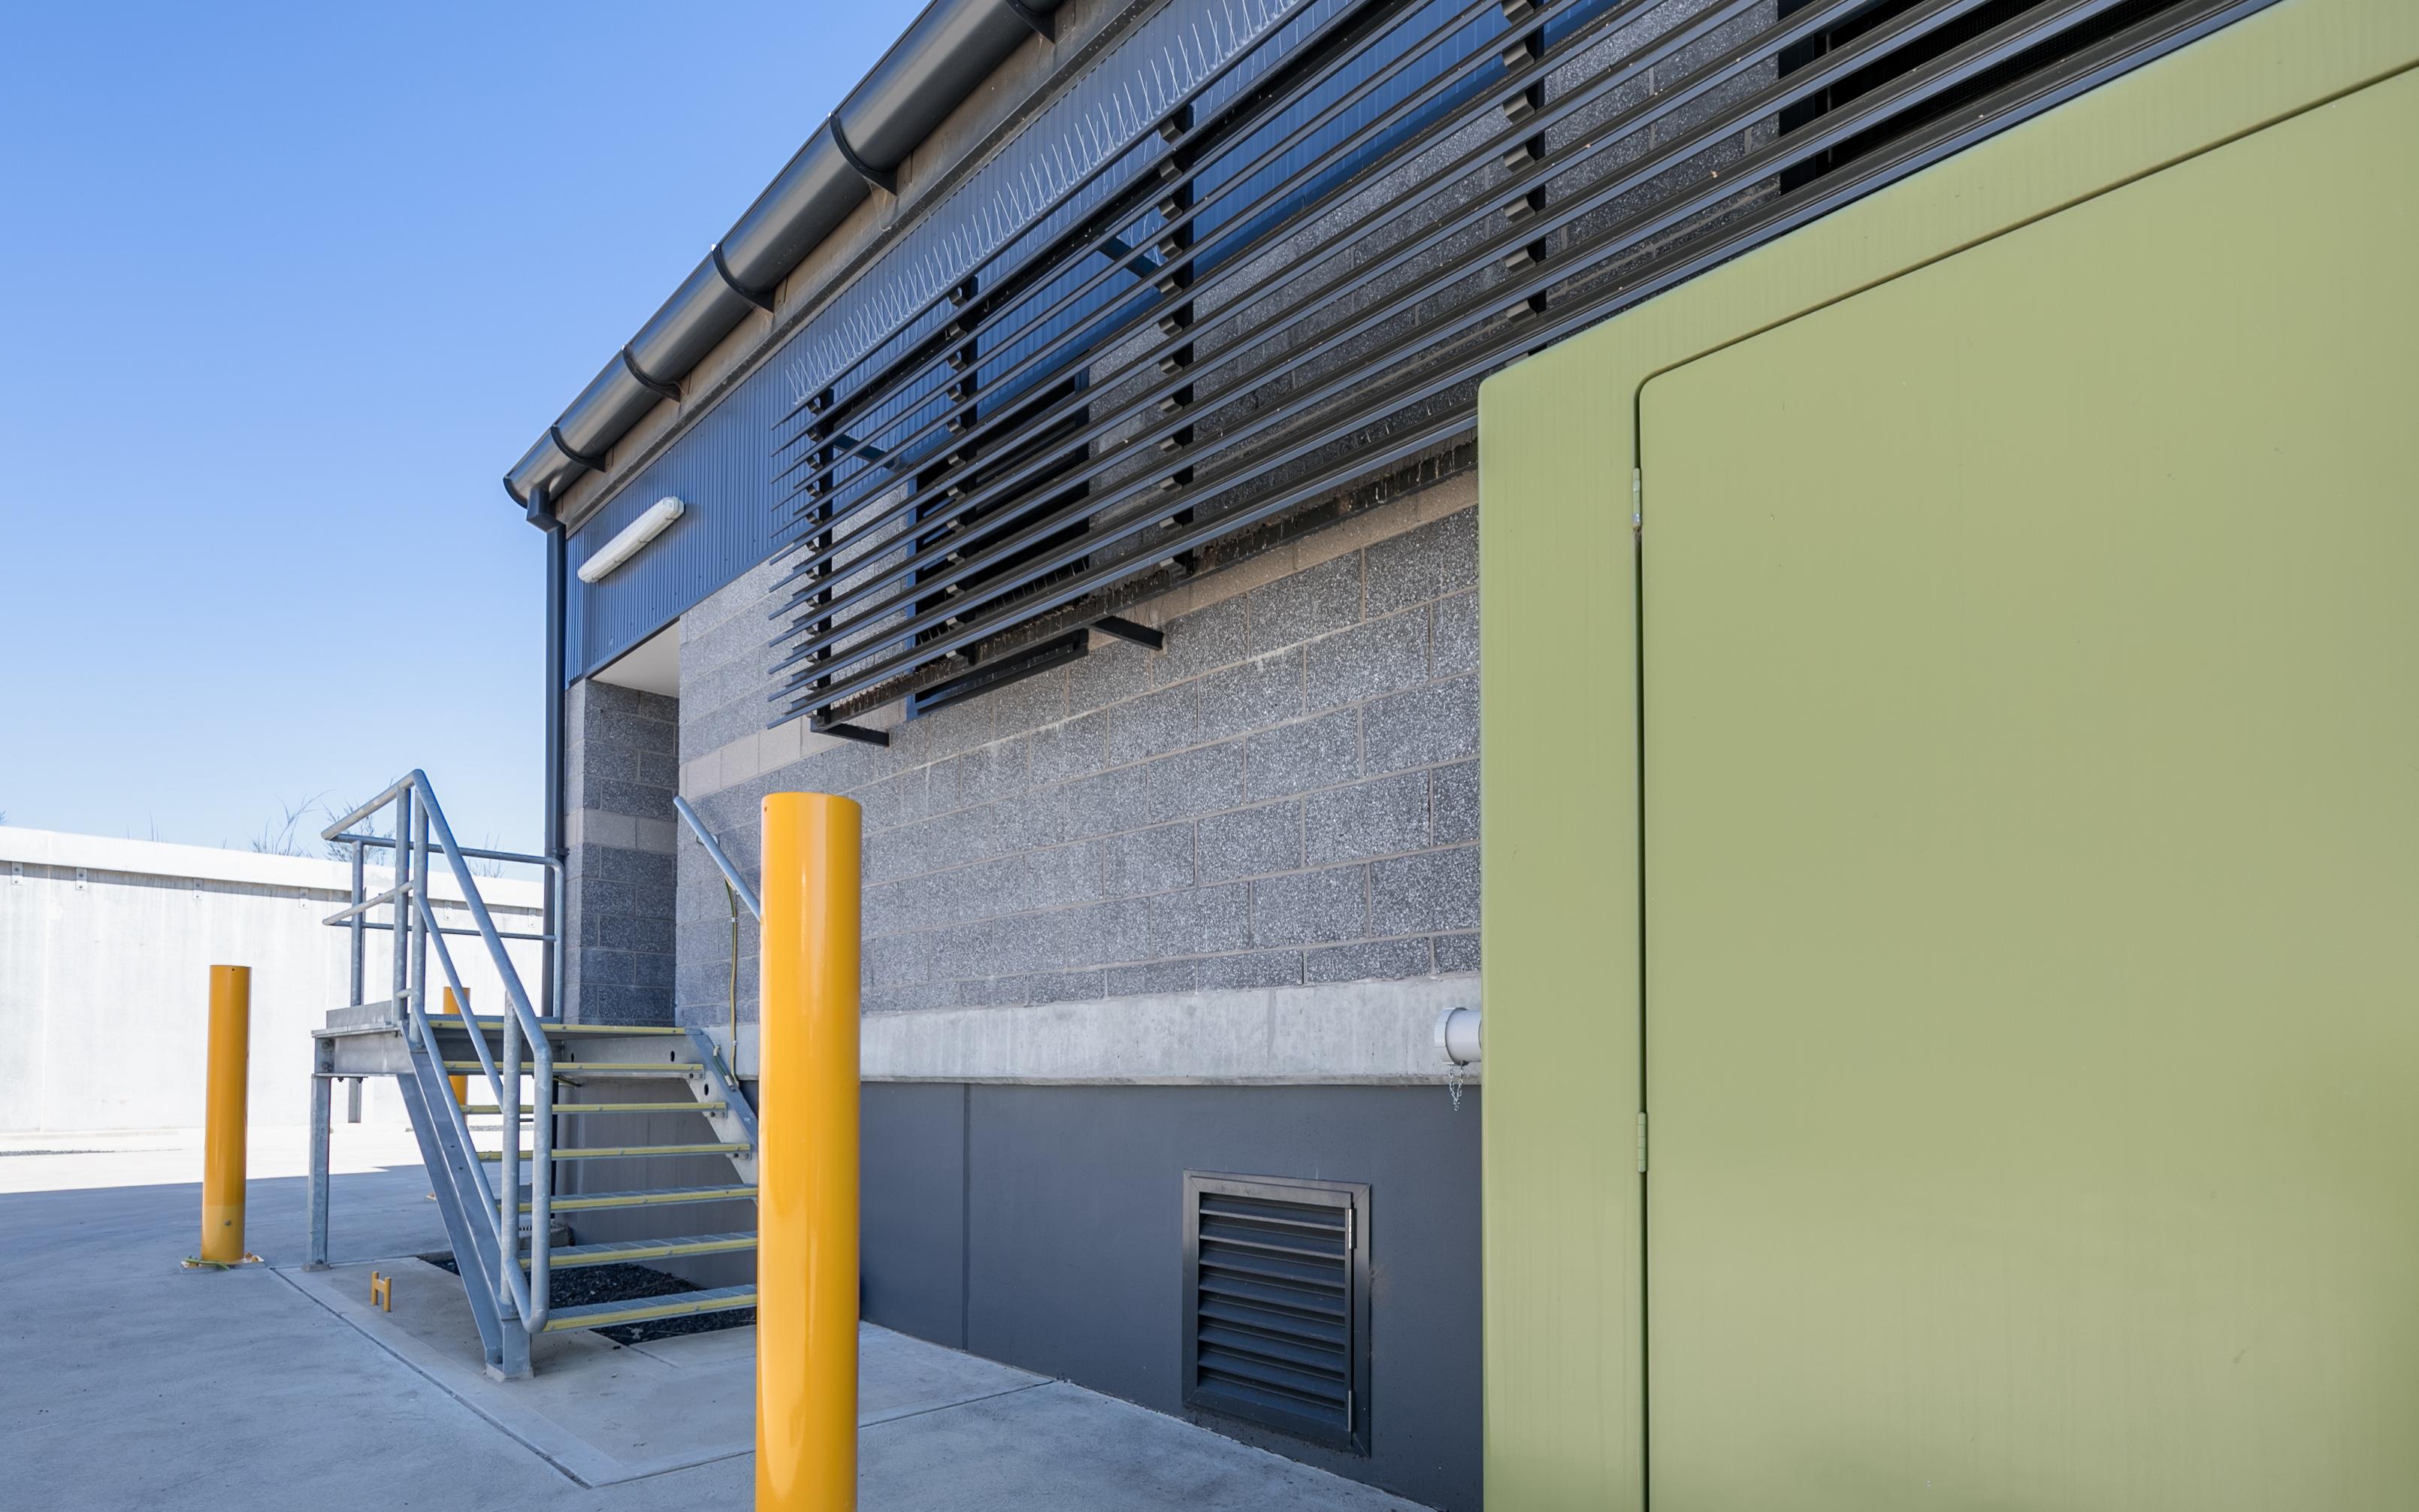 Gez-Xavier-Mansfield-Photography-Avant-Constructions-MarsdenPark-Substation-Project-August-2017-13